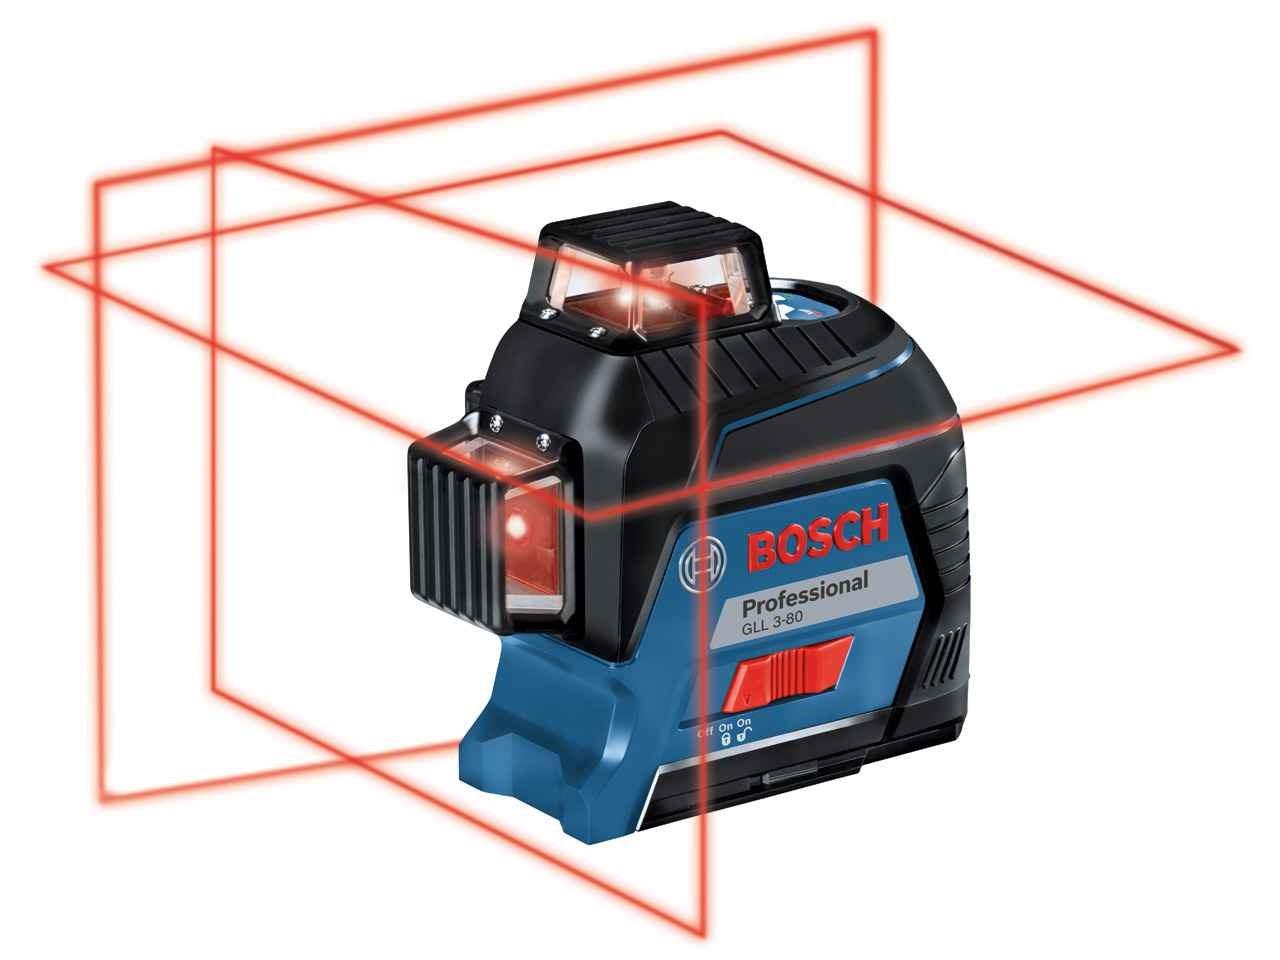 bosch gll 3 80 professional cross line laser. Black Bedroom Furniture Sets. Home Design Ideas